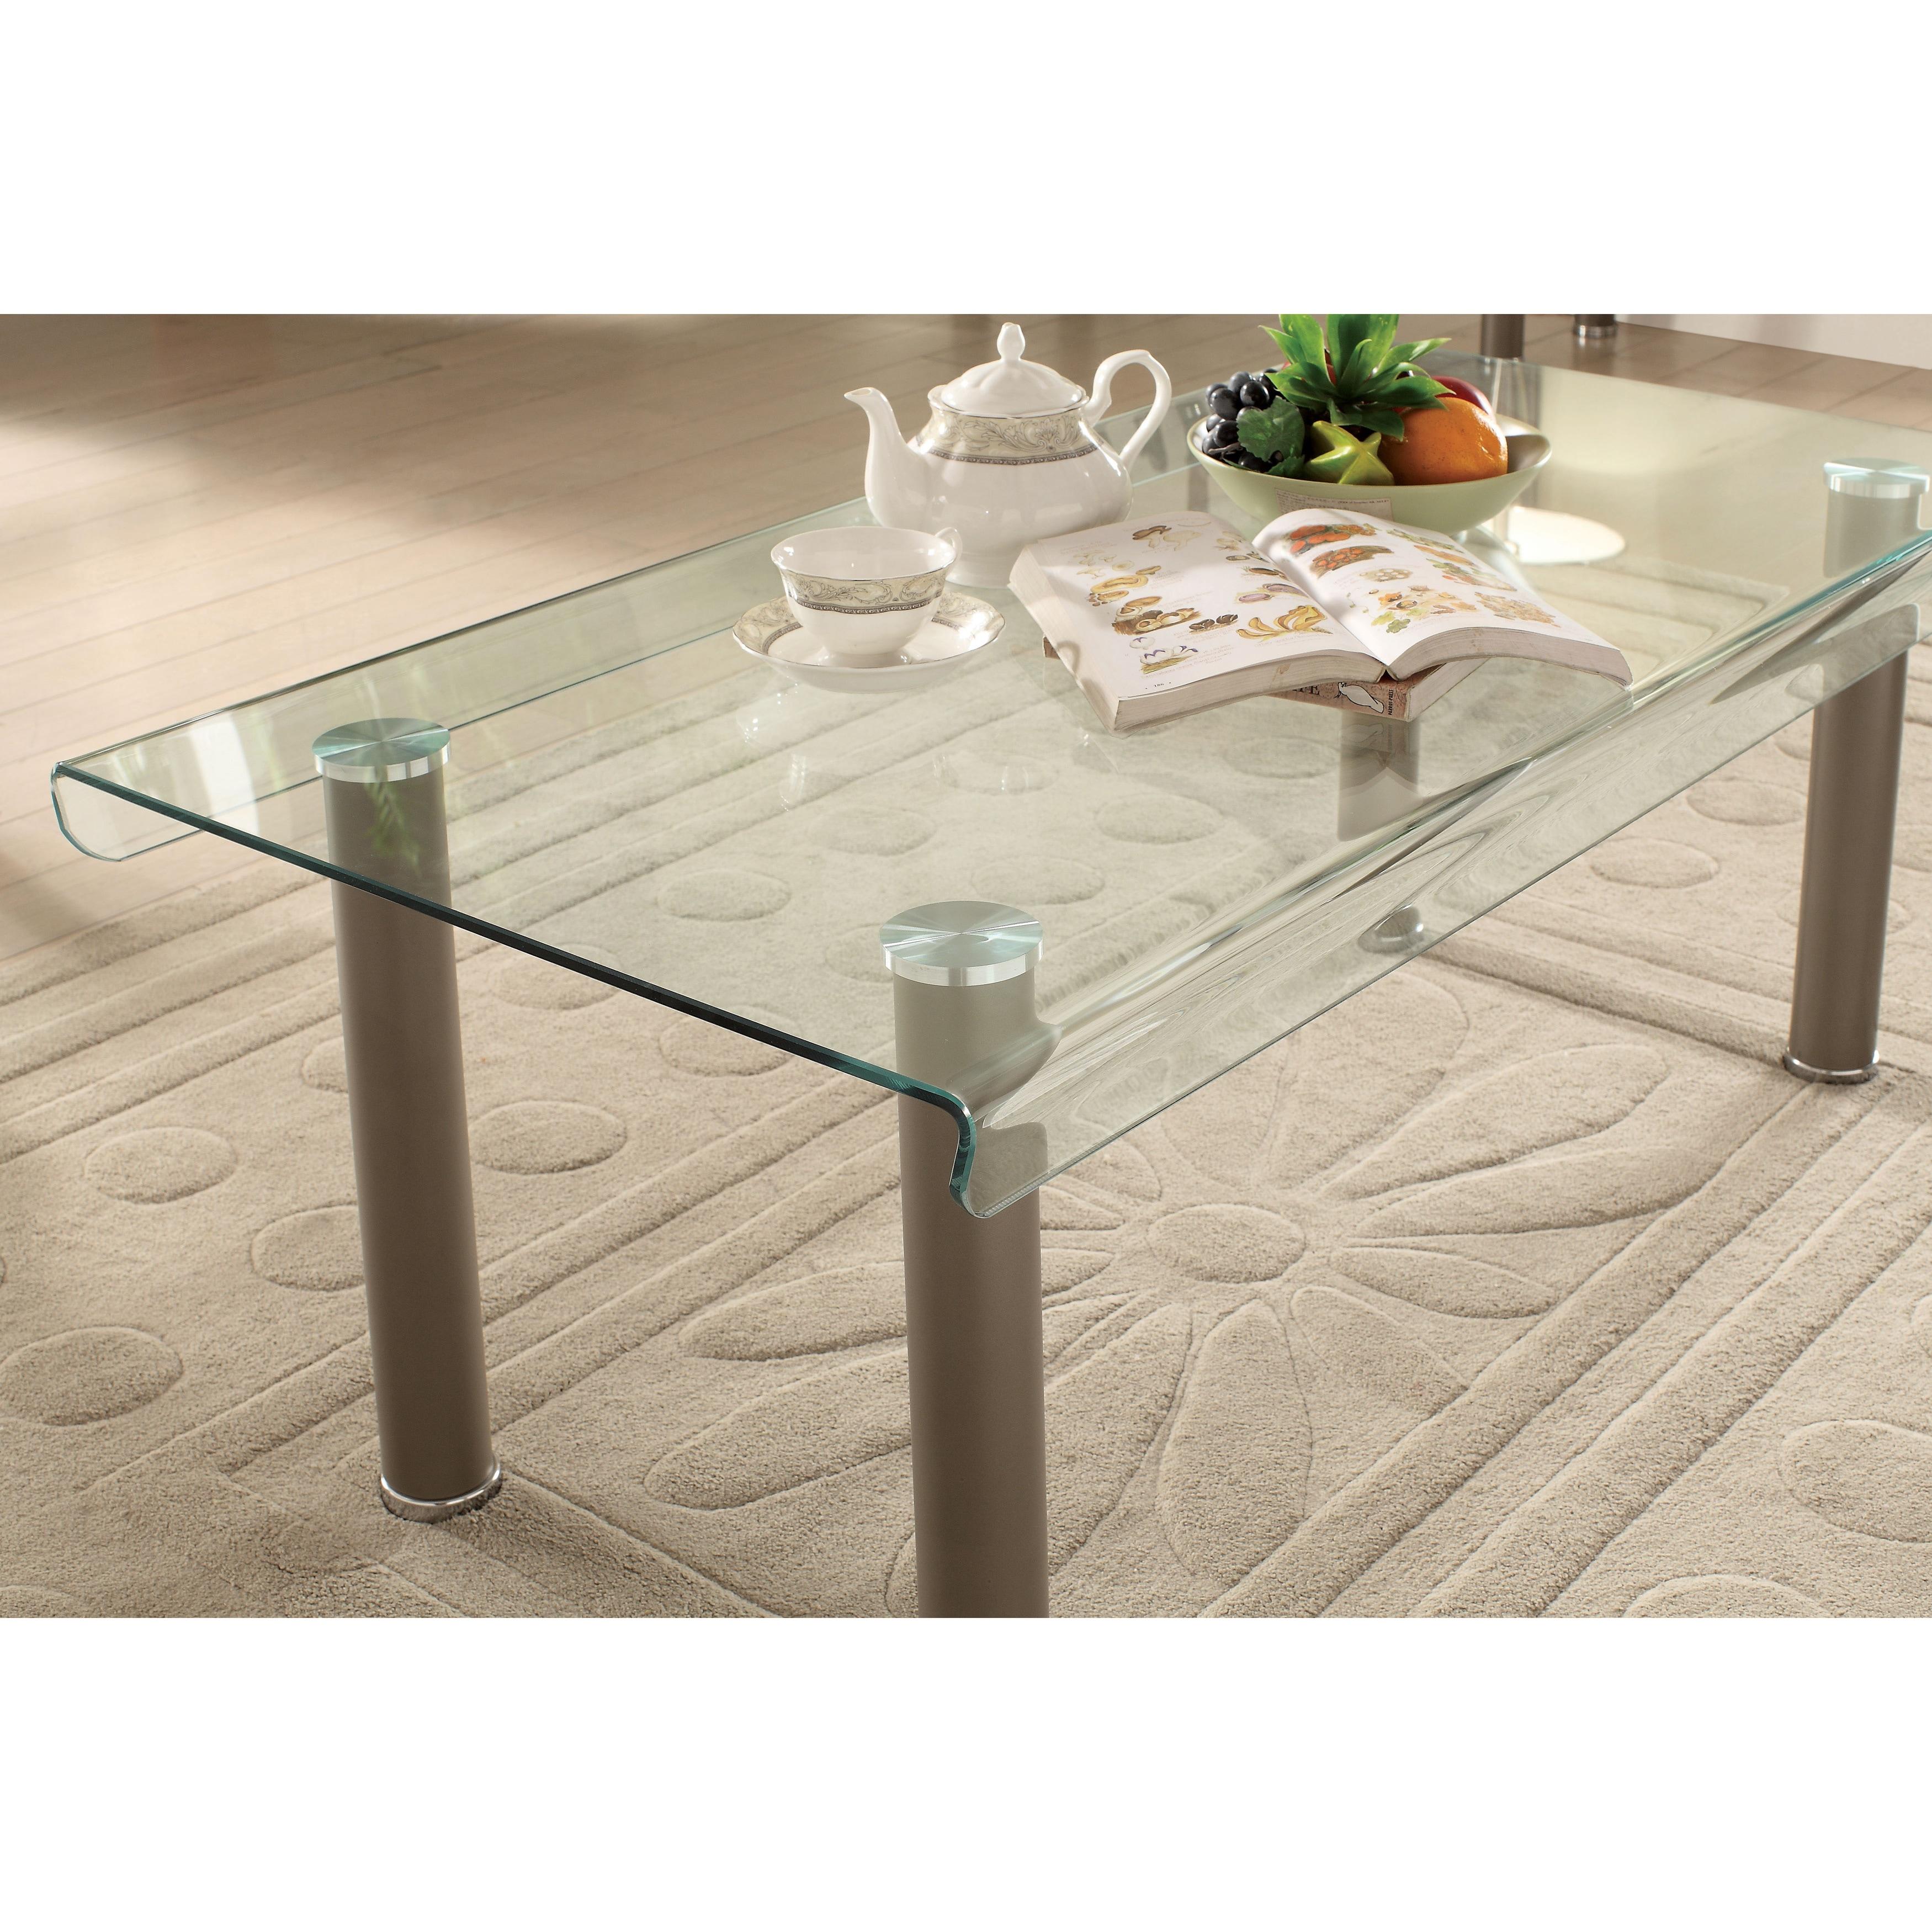 Furniture of America Creme Contemporary 3 piece Glass